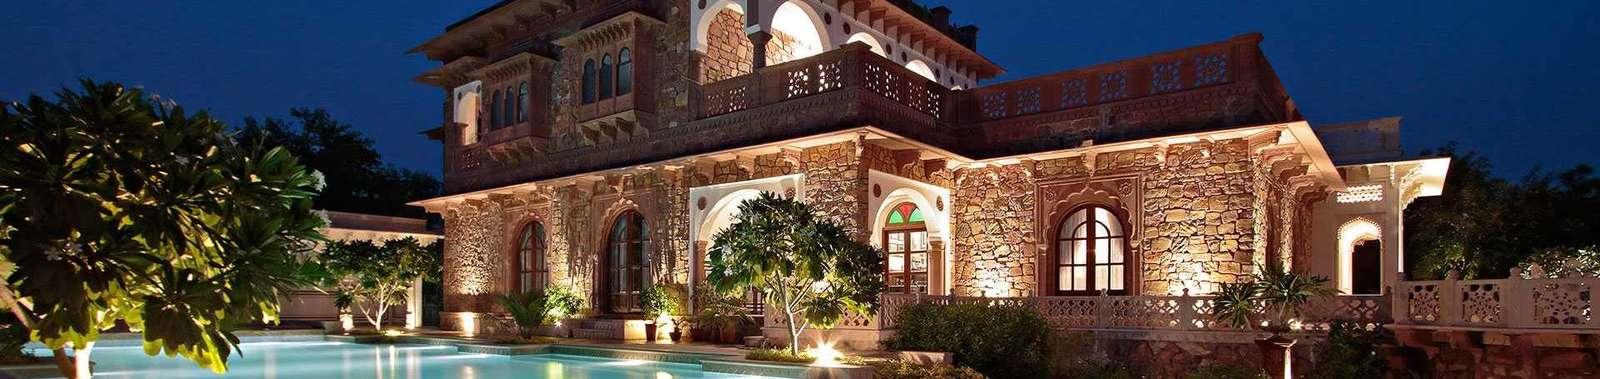 In Rajasthan, stay at Khas Bagh, a farm retreat near Jaipur